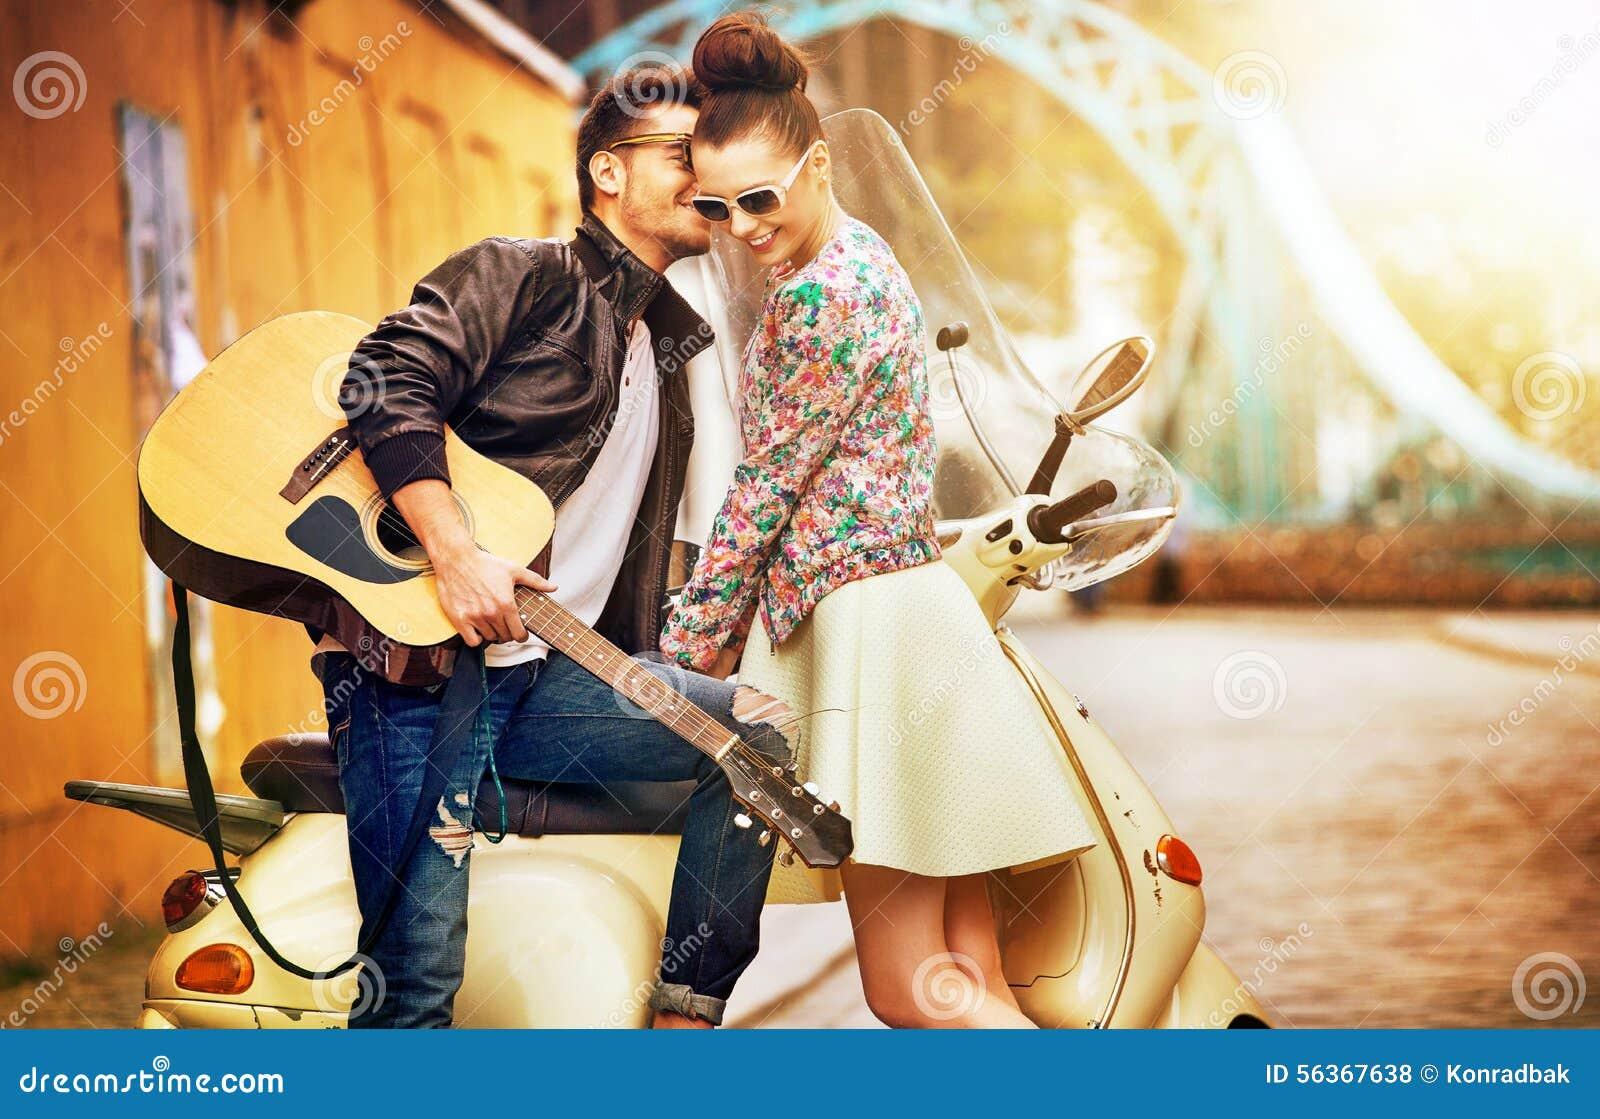 Romantic Portrait Of People In Love Stock Photo - Image ...